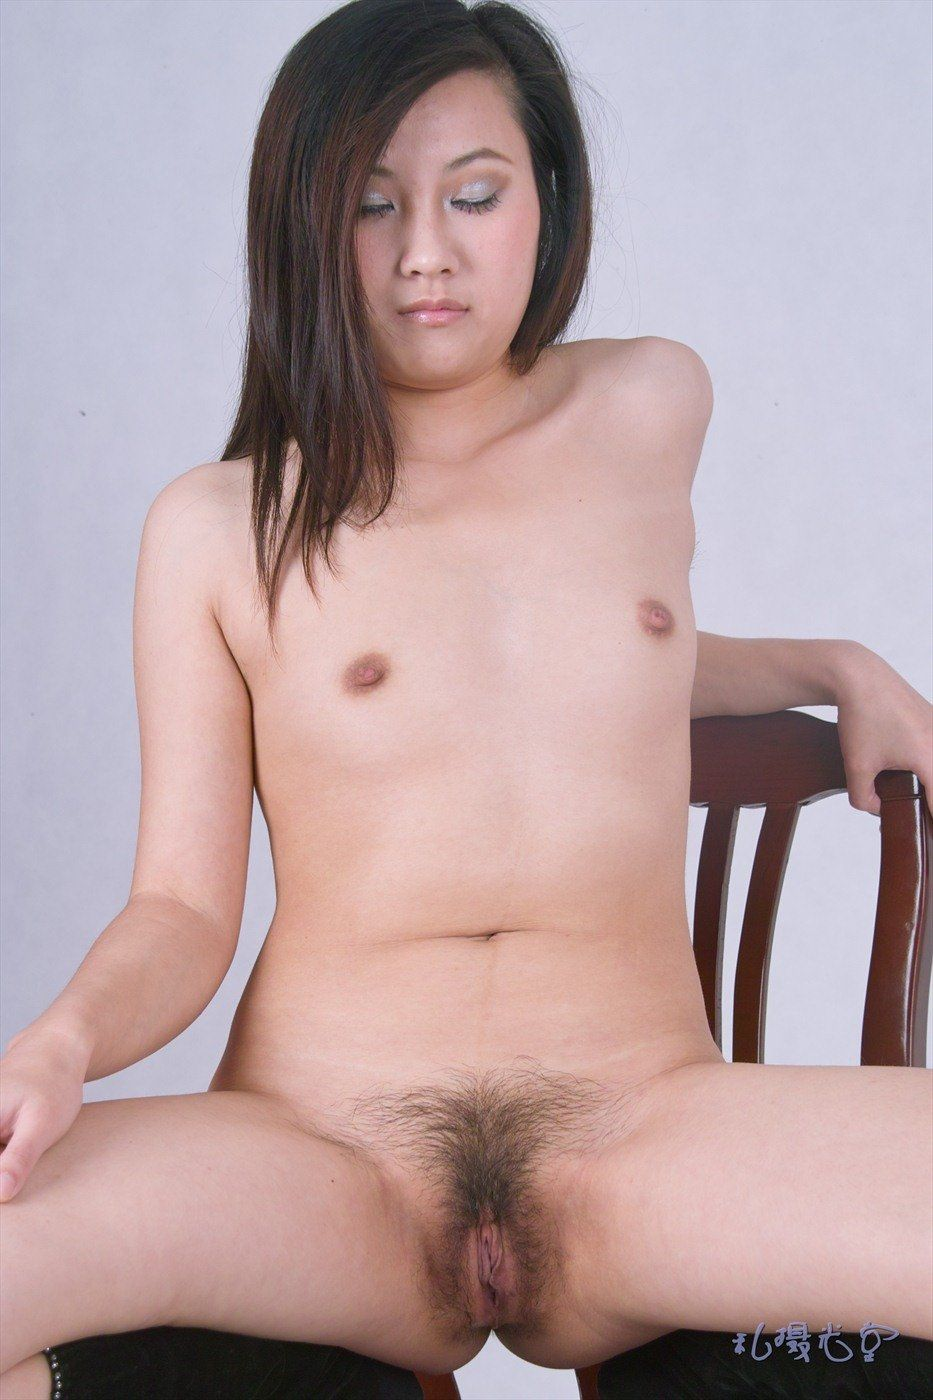 Real hot filipino male naked